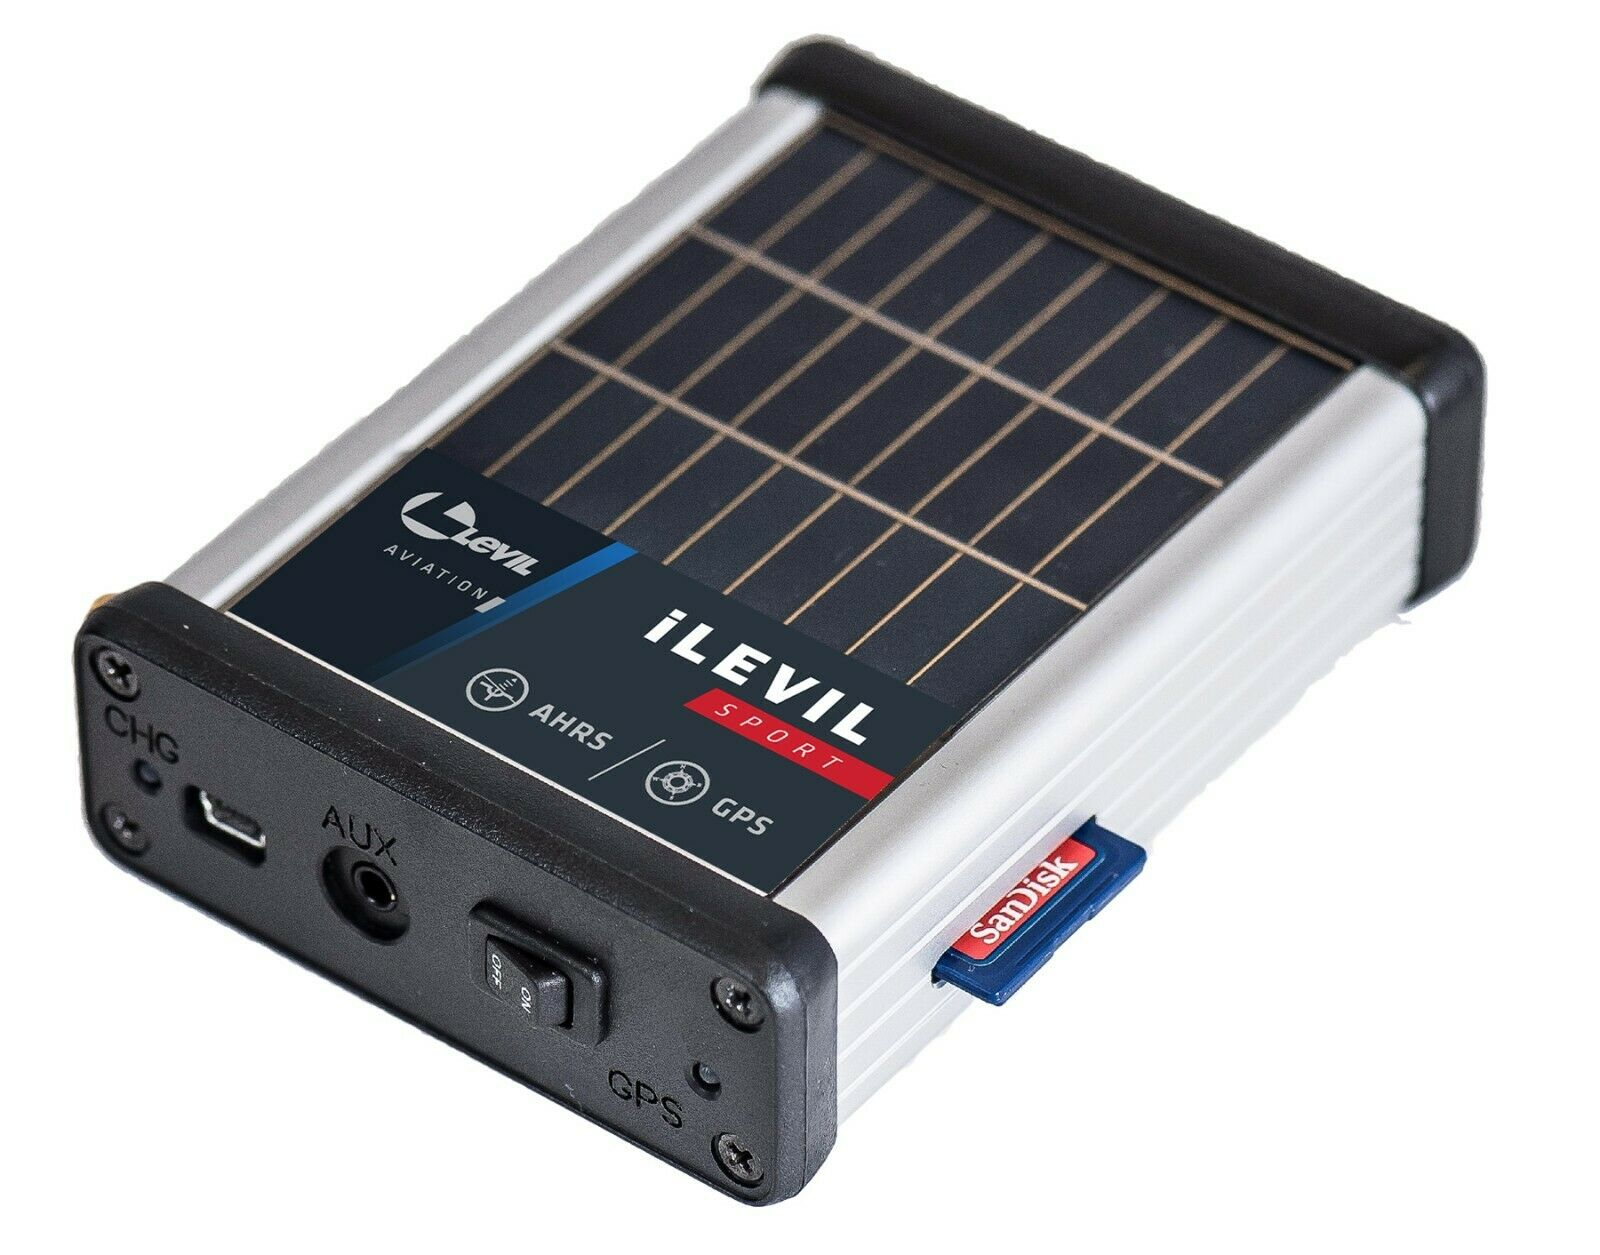 Levil 3 SW Portable ADS-B + GPS + AHRS Stratus uAvionics tailBeacon Garmin G5